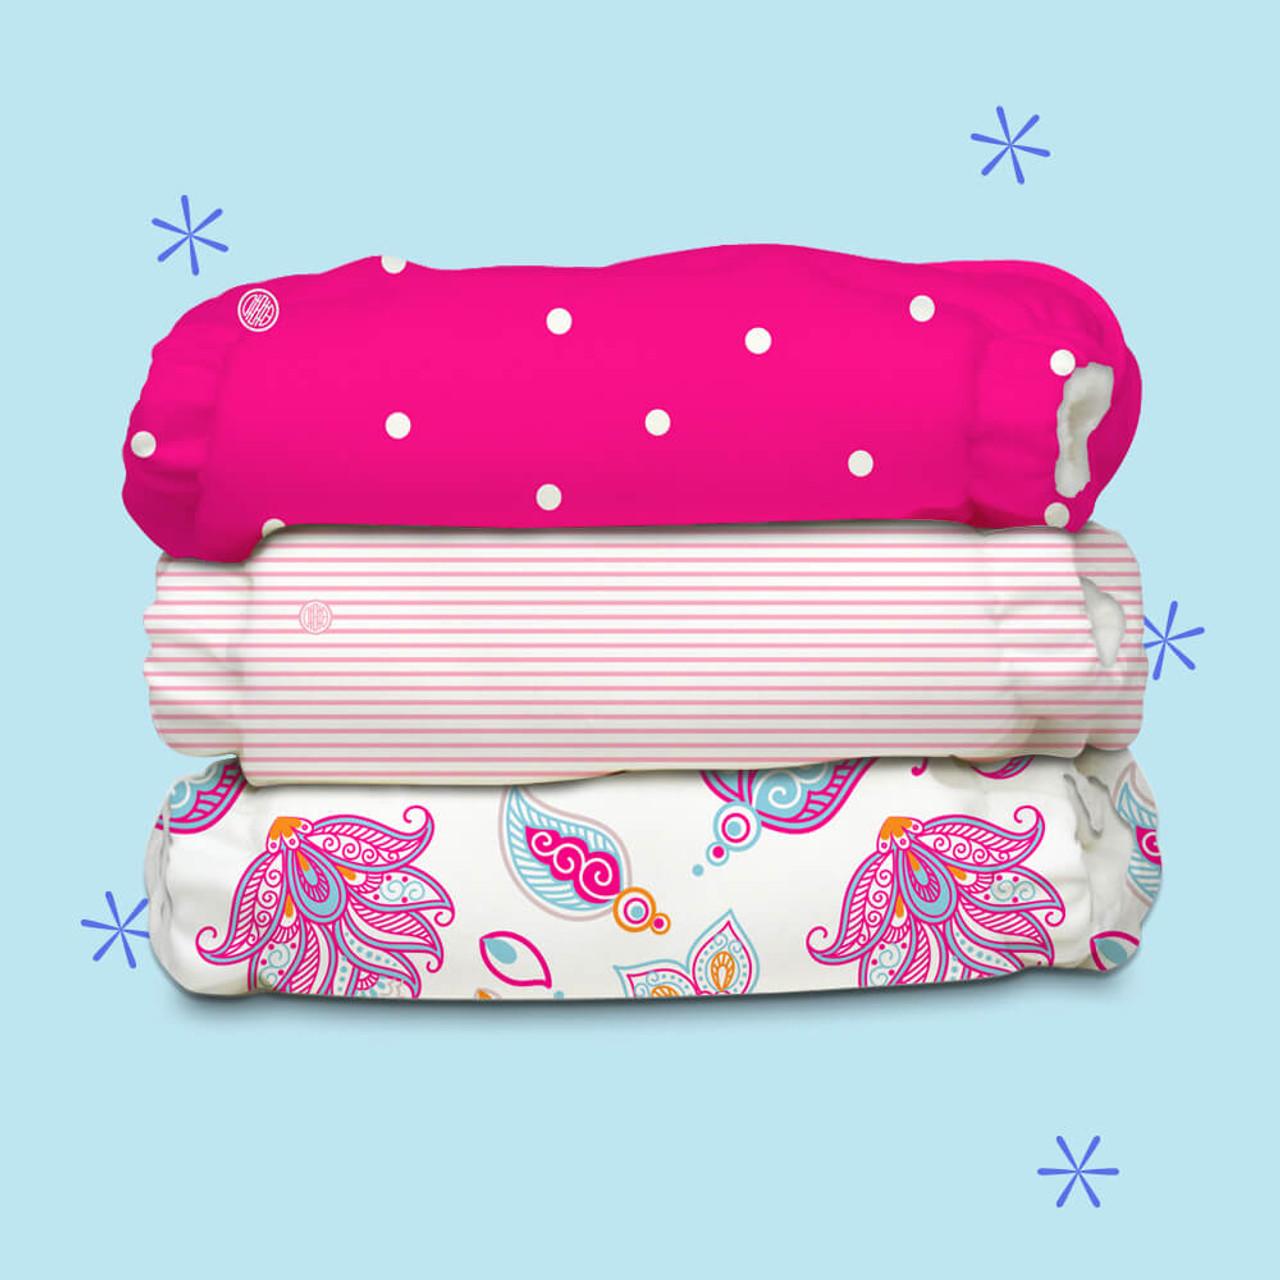 Free Size Cloth Diaper - Super Saver Pack of 3 - Gratitude